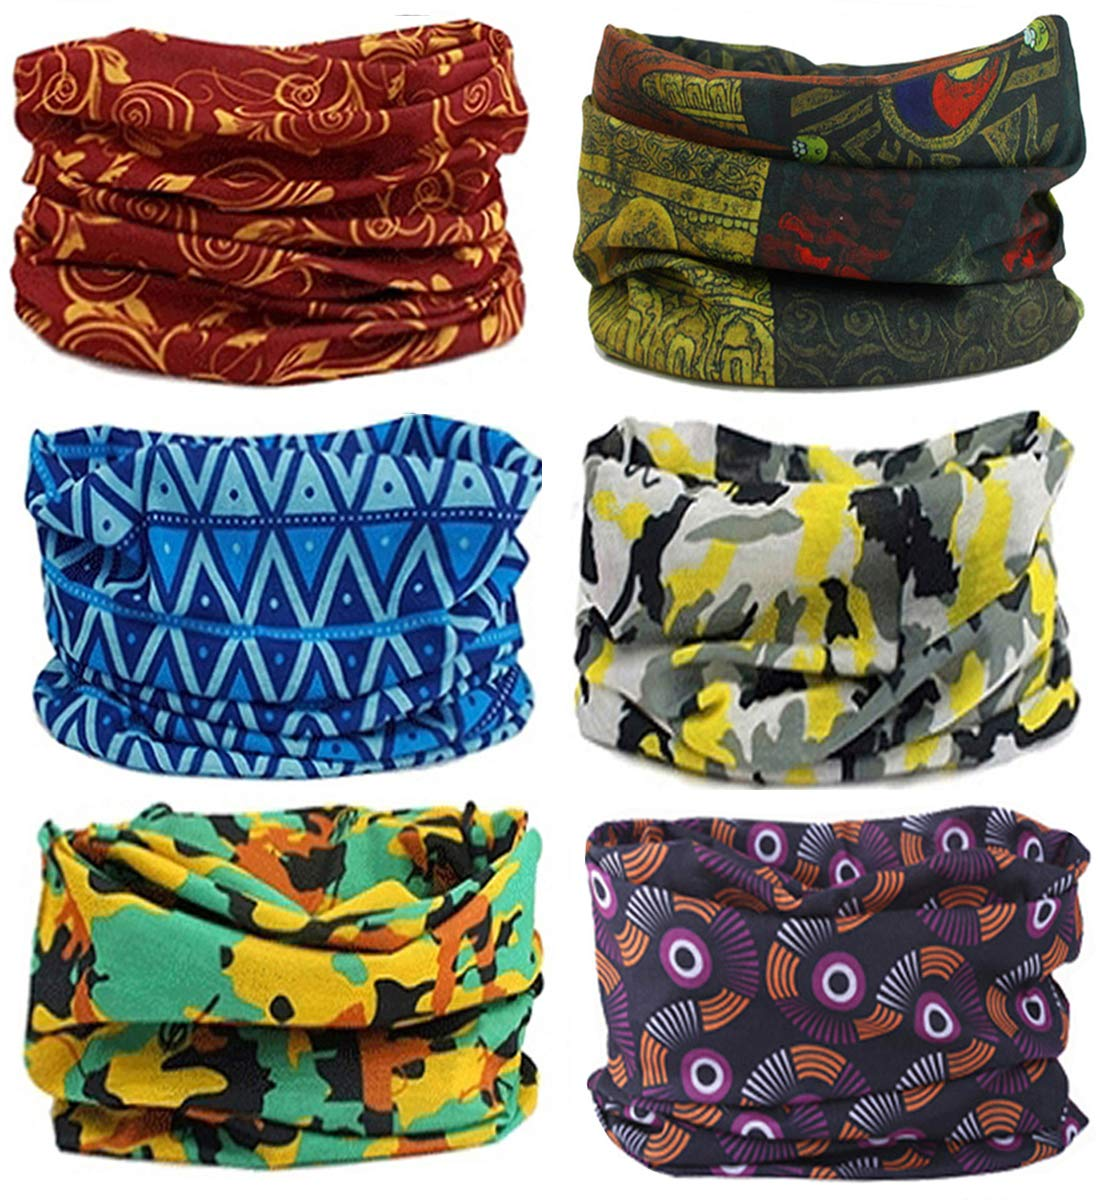 SmilerSmile 6pcs Assorted Seamless Outdoor Sport Bandanna Headwrap Scarf Wrap, 12 in 2 High Elastic Magic Headband & Collars Muffler Scarf Face Mask UV Resistance(31 Print1)